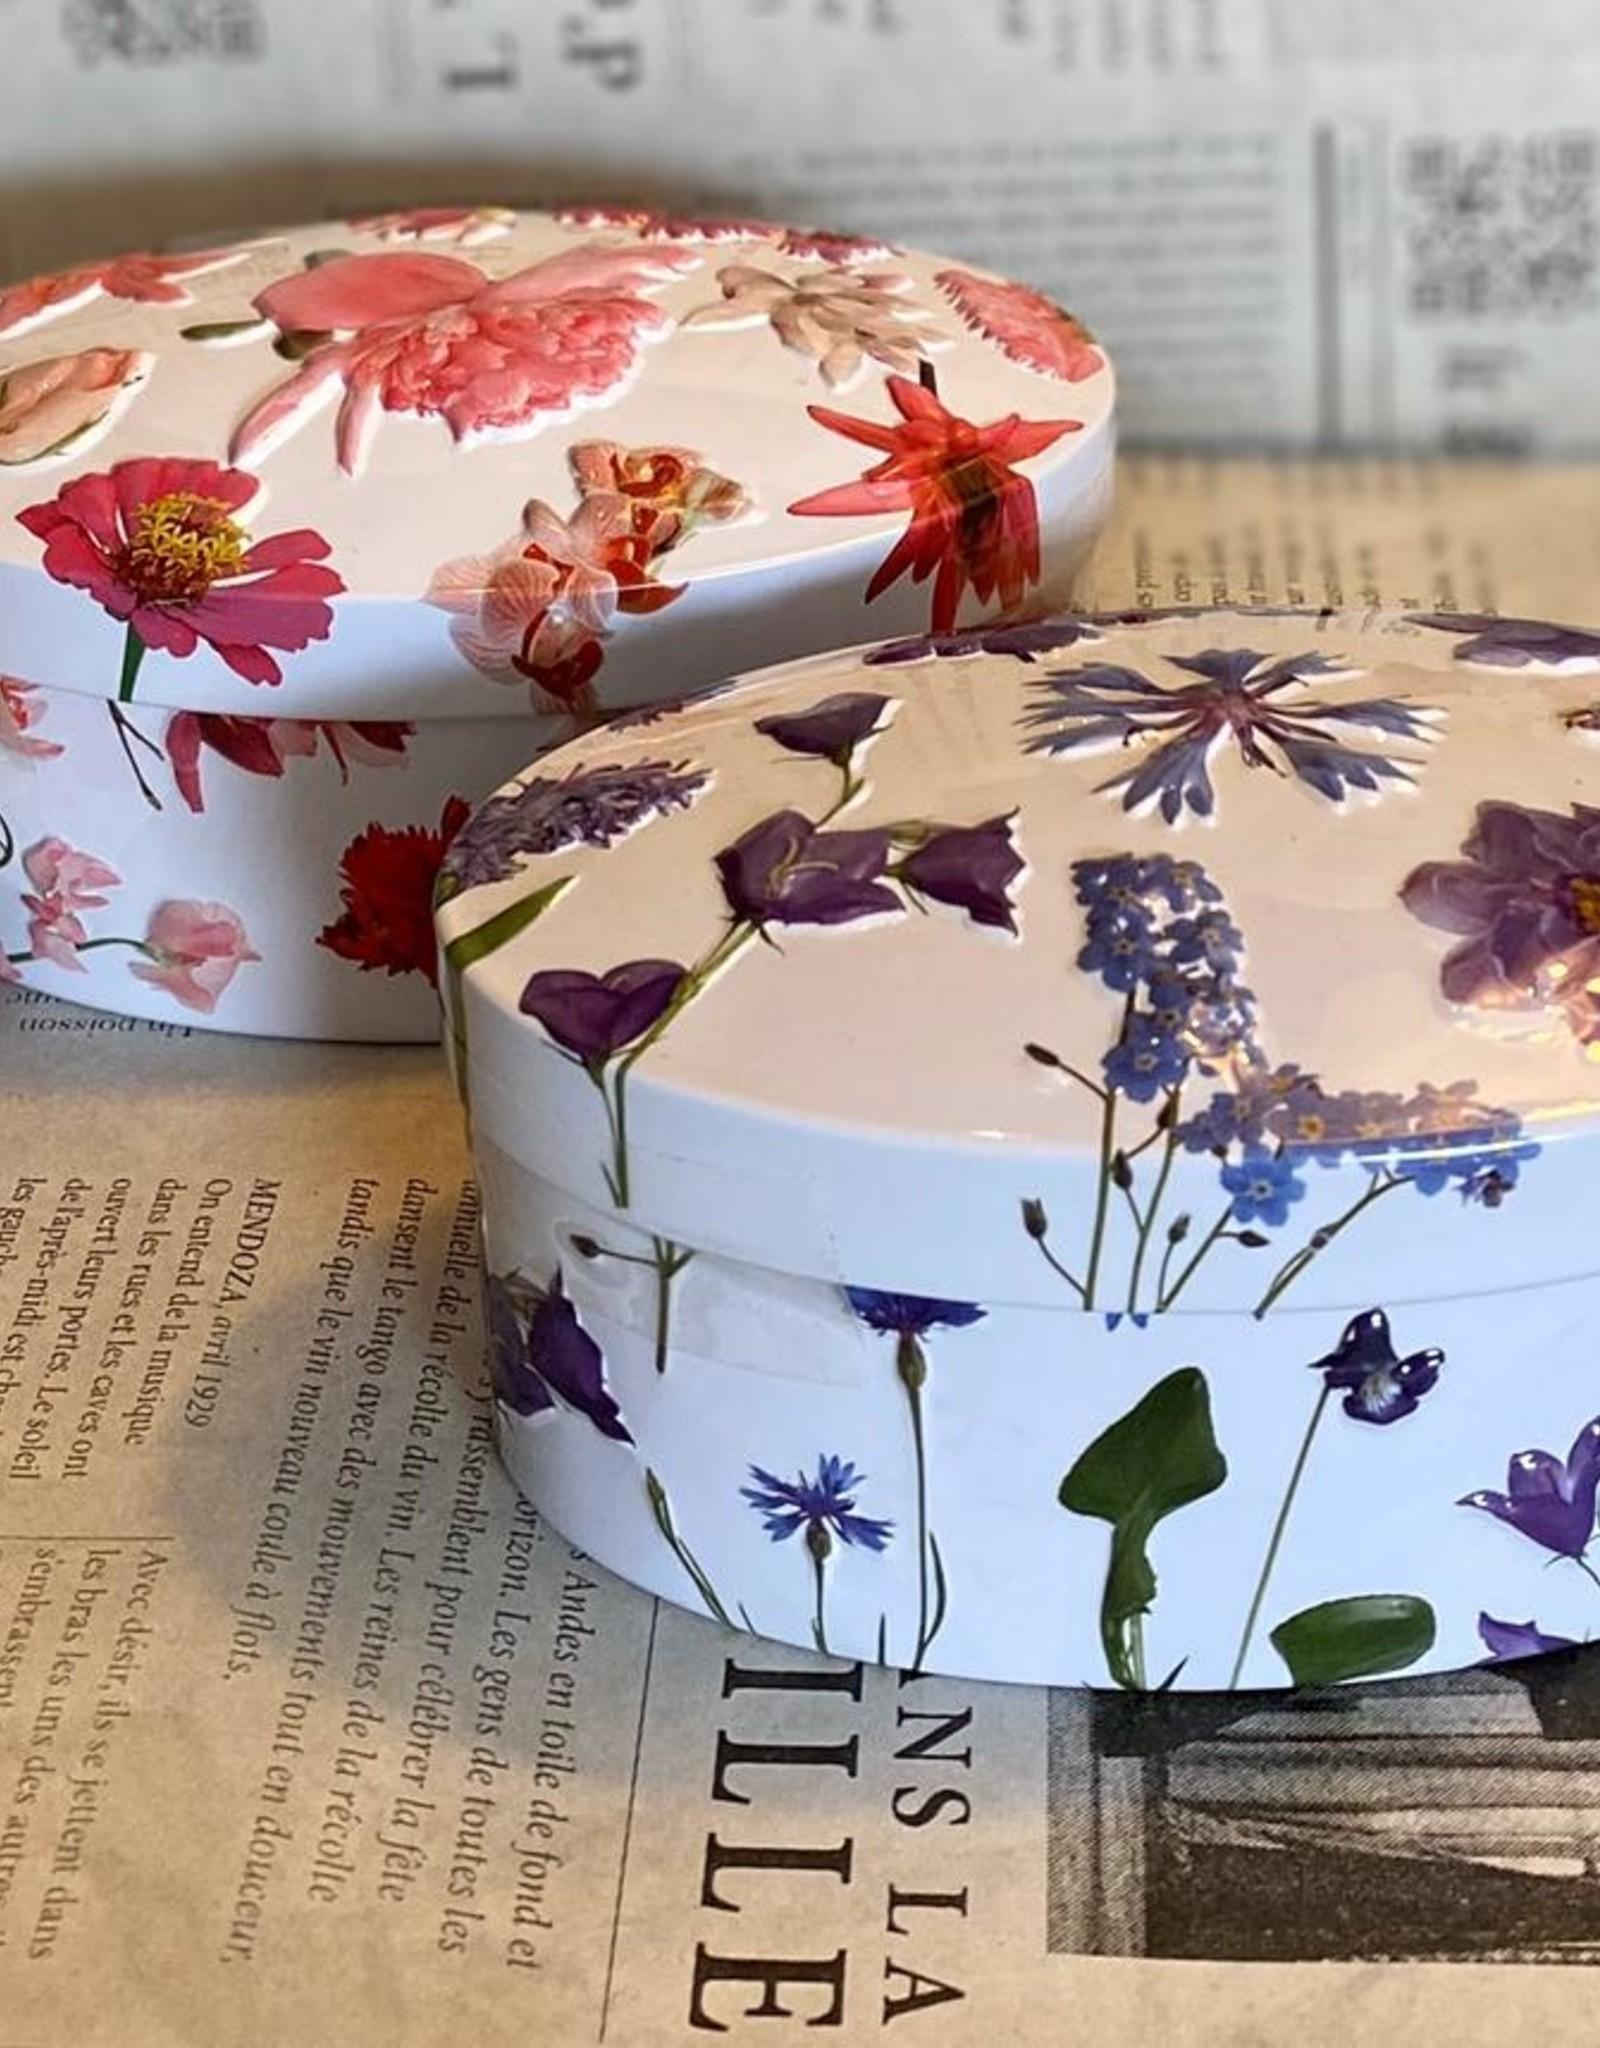 Gardiners fudge Wild flower tin vanilla fudge